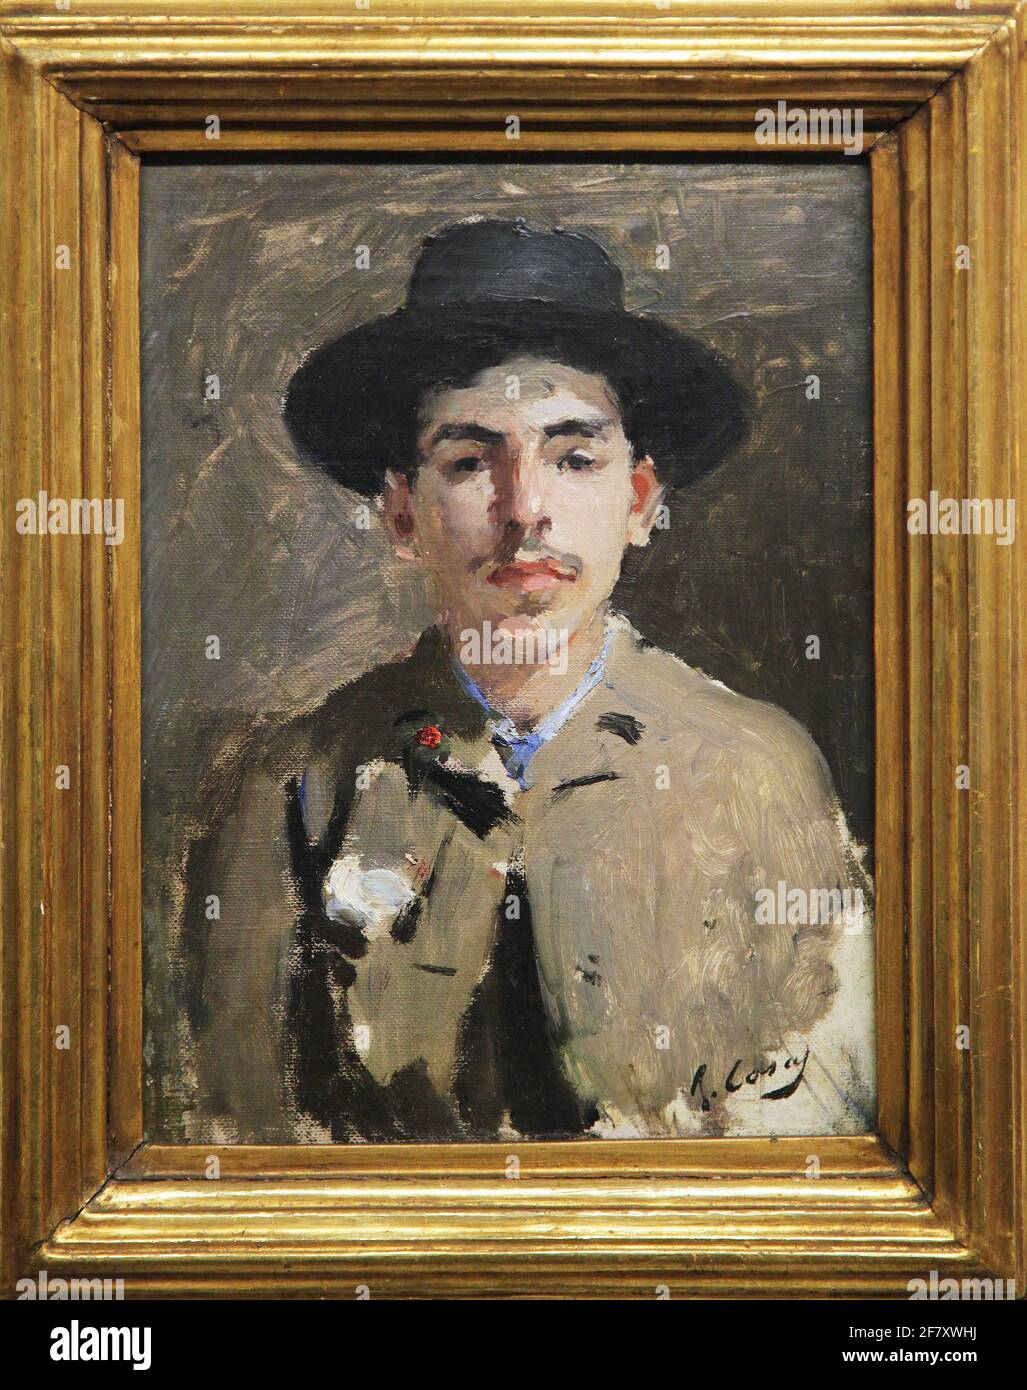 Self-portrait by Ramon Casas i Carbó or Ramon Casas 1866-1932 Stock Photo